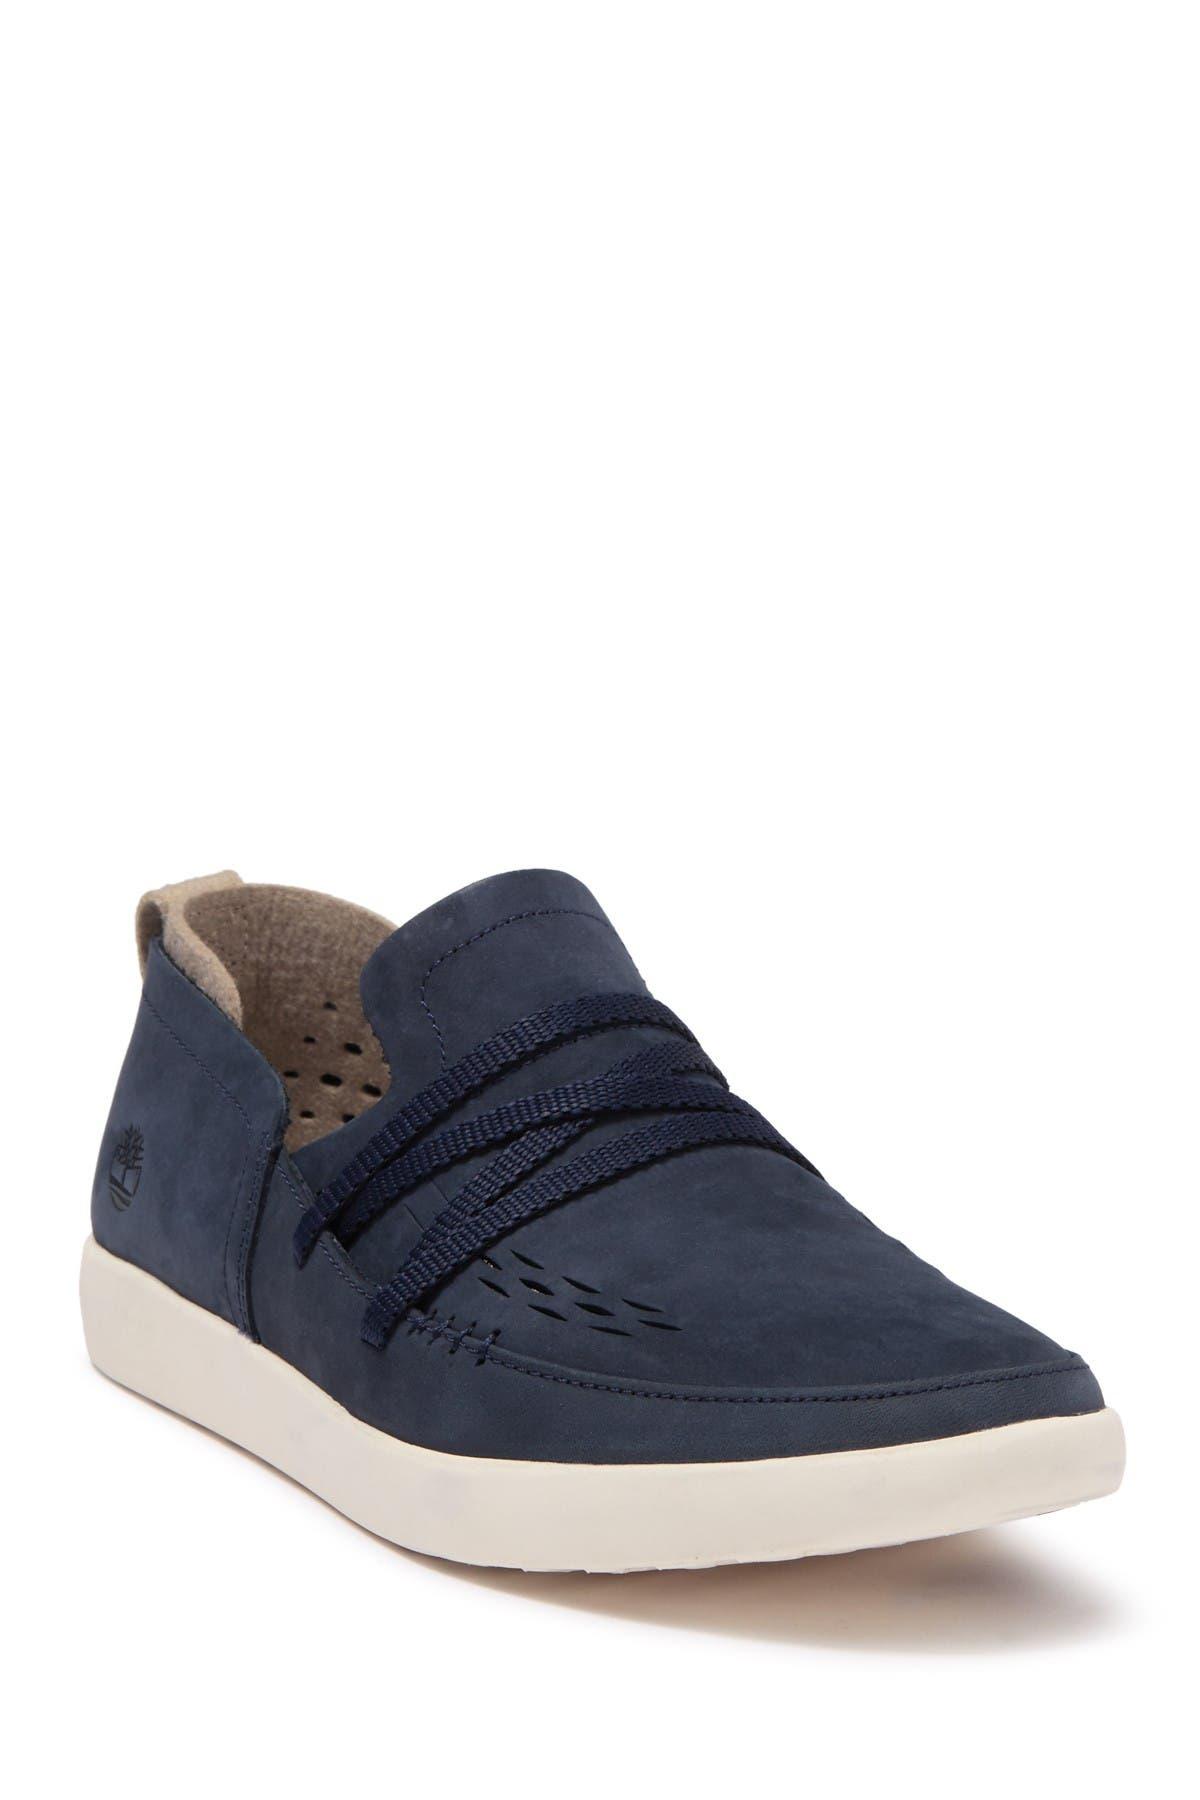 Project Better Vented Slip-On Sneaker